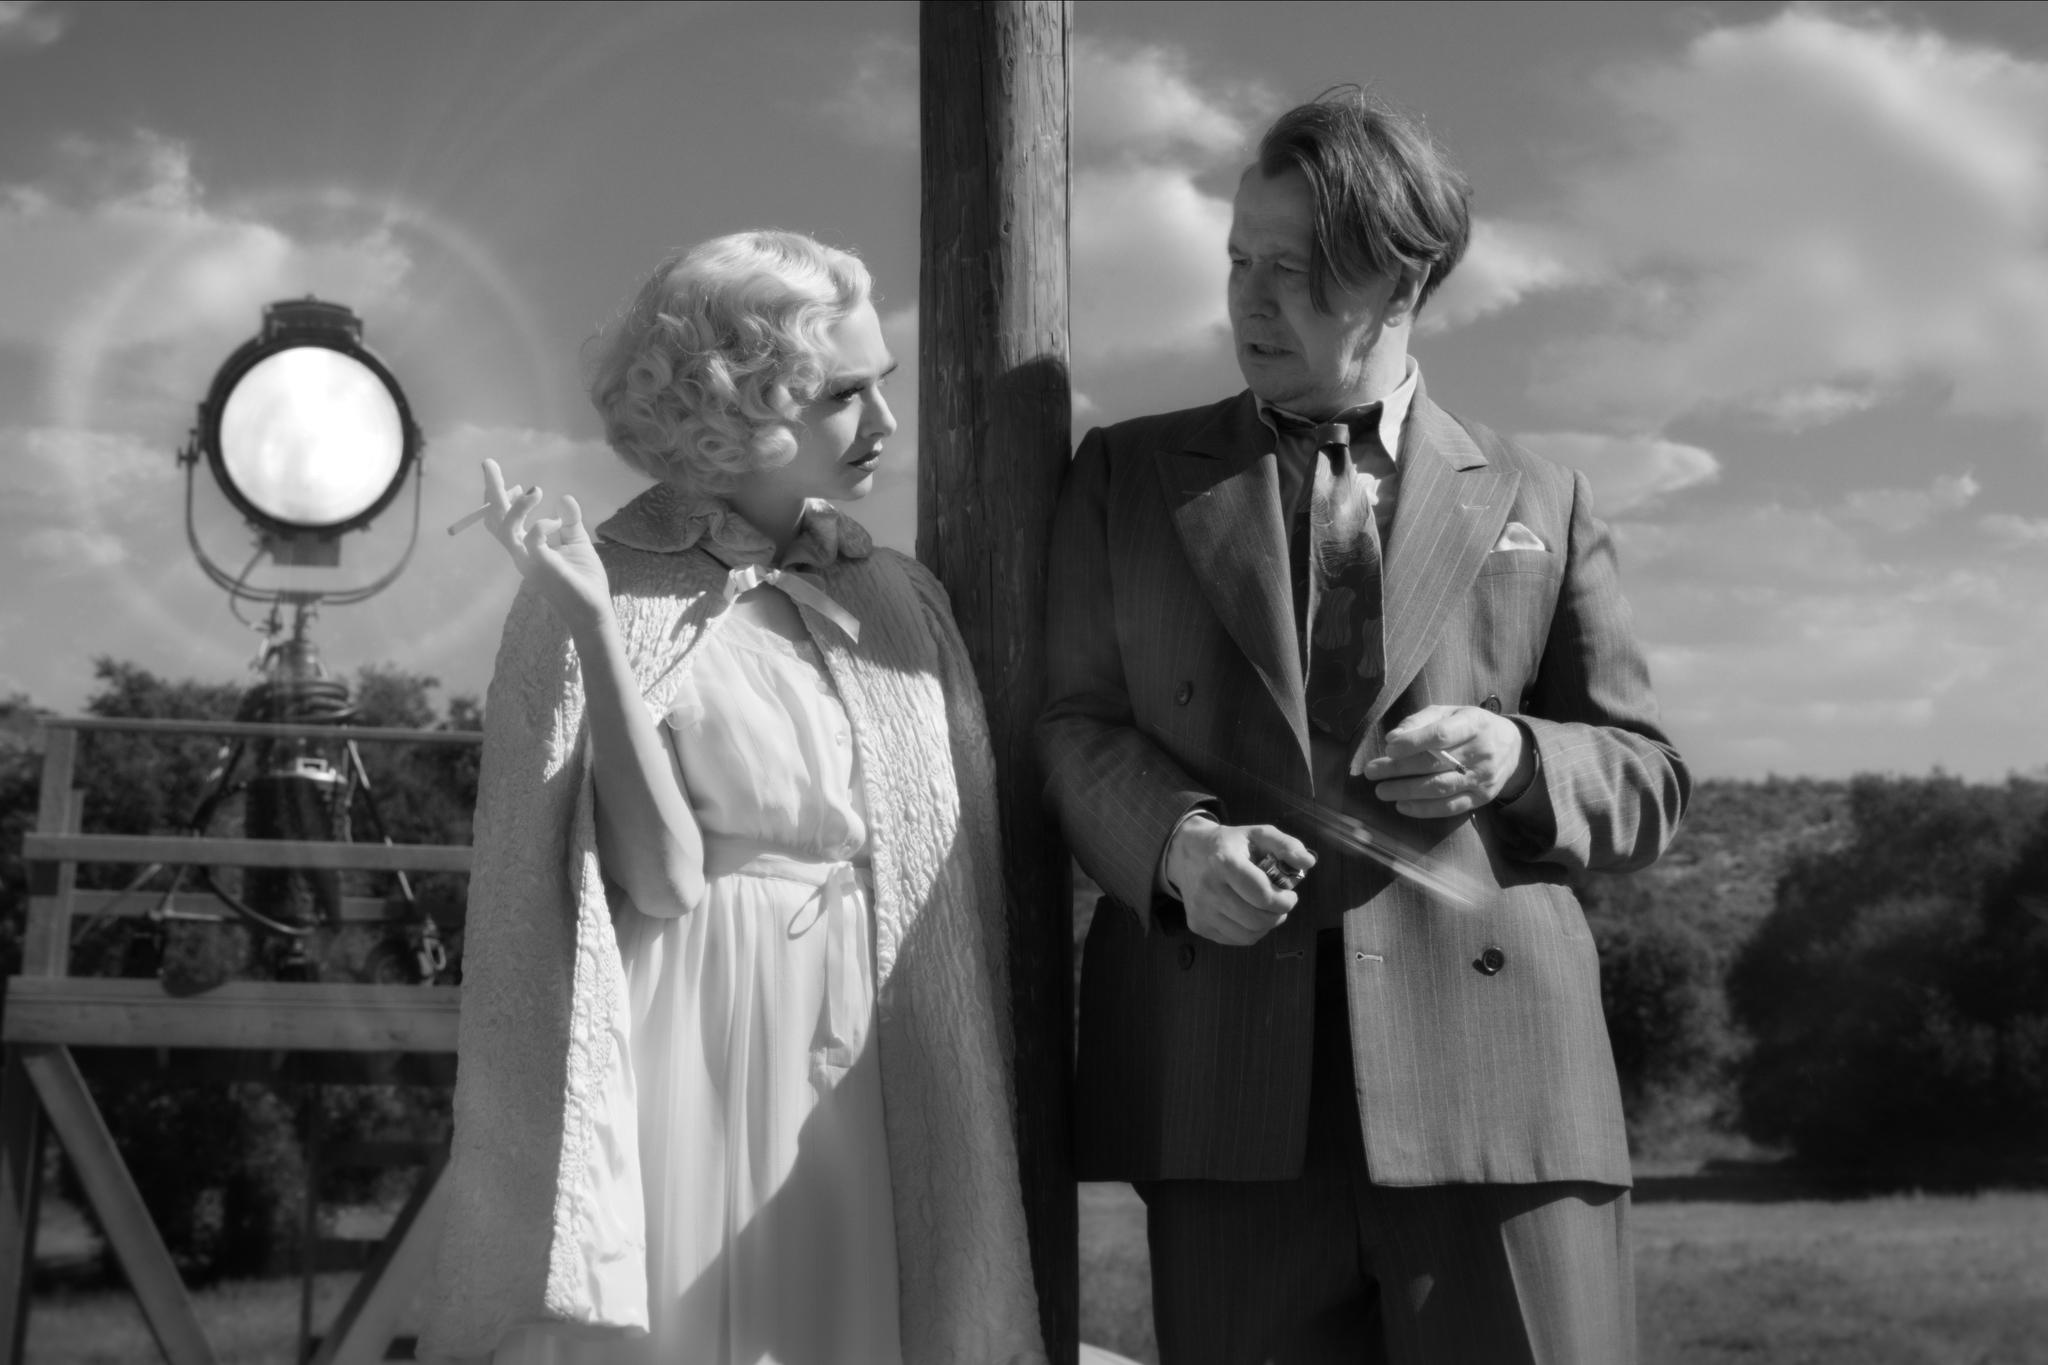 MANK (2020)Amanda Seyfried as Marion Davies and Gary Oldman as Herman Mankiewicz.